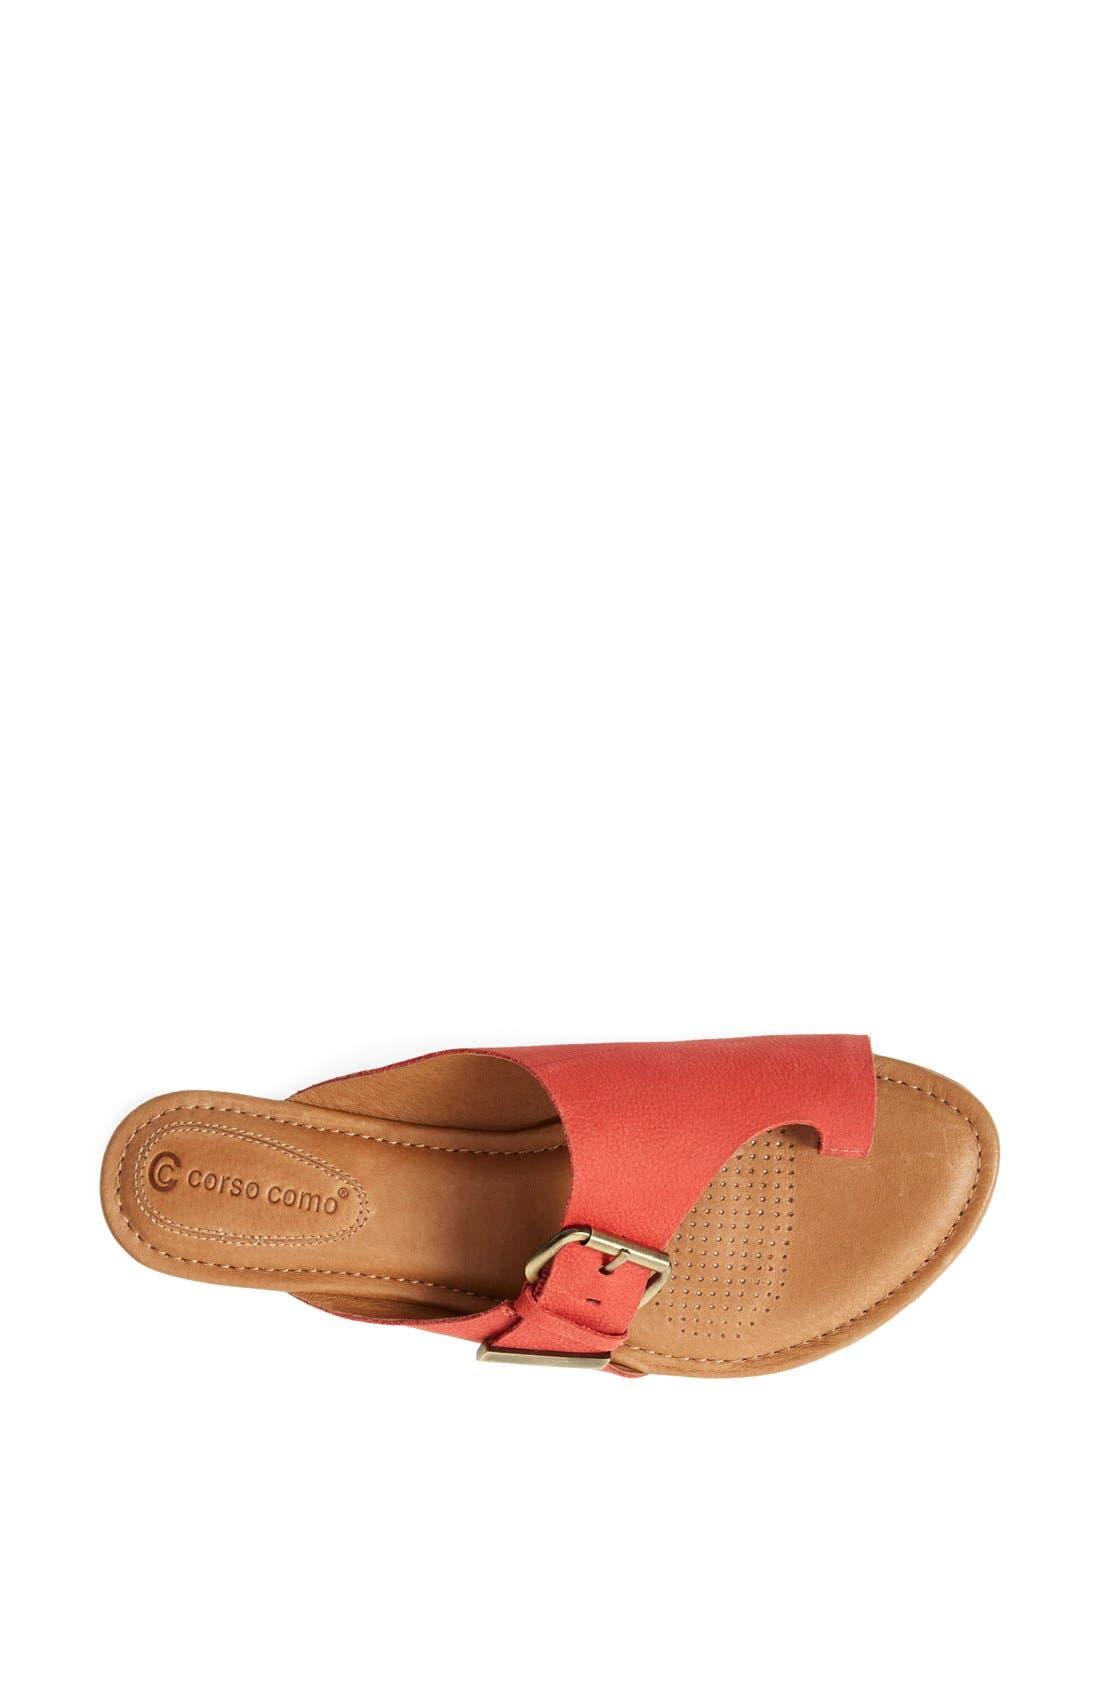 Alternate Image 3  - Corso Como 'Slim' Sandal